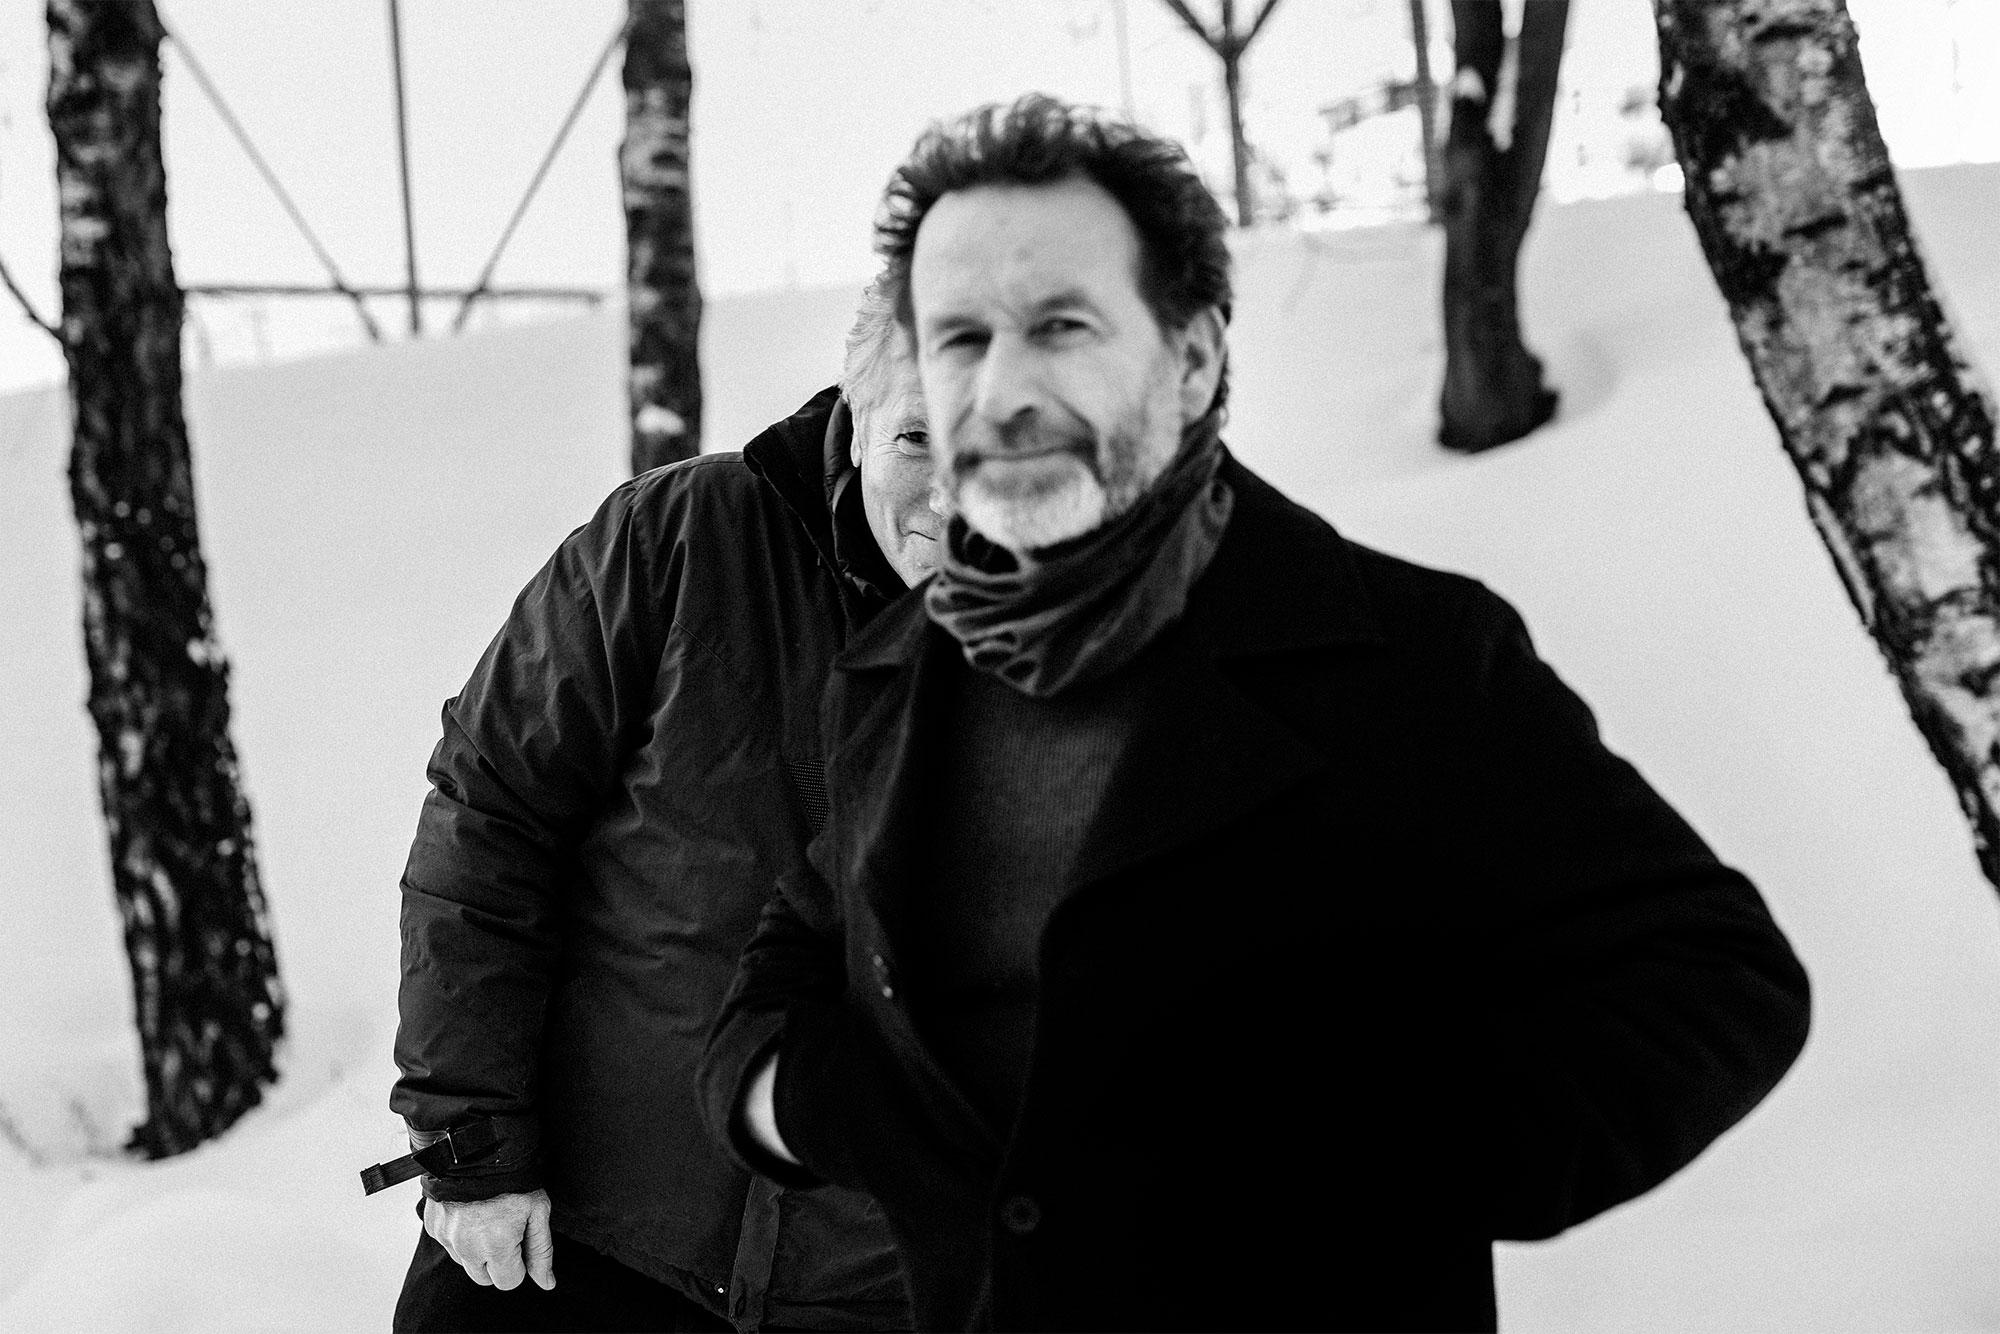 Hans Petter Moland/Per Petterson